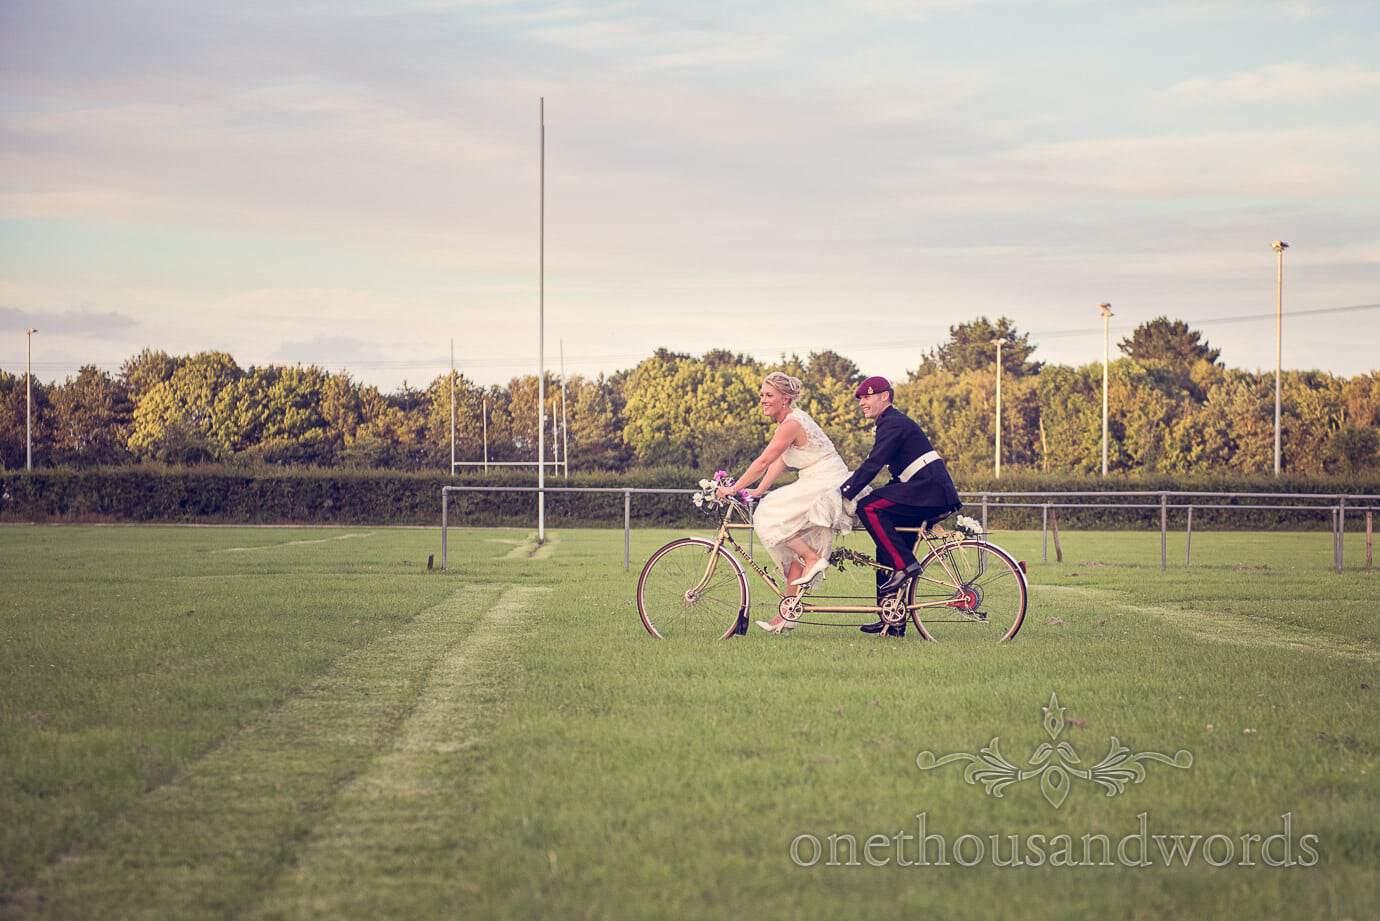 Bride and Groom ride tandem bike at Wareham Rugby Club Wedding